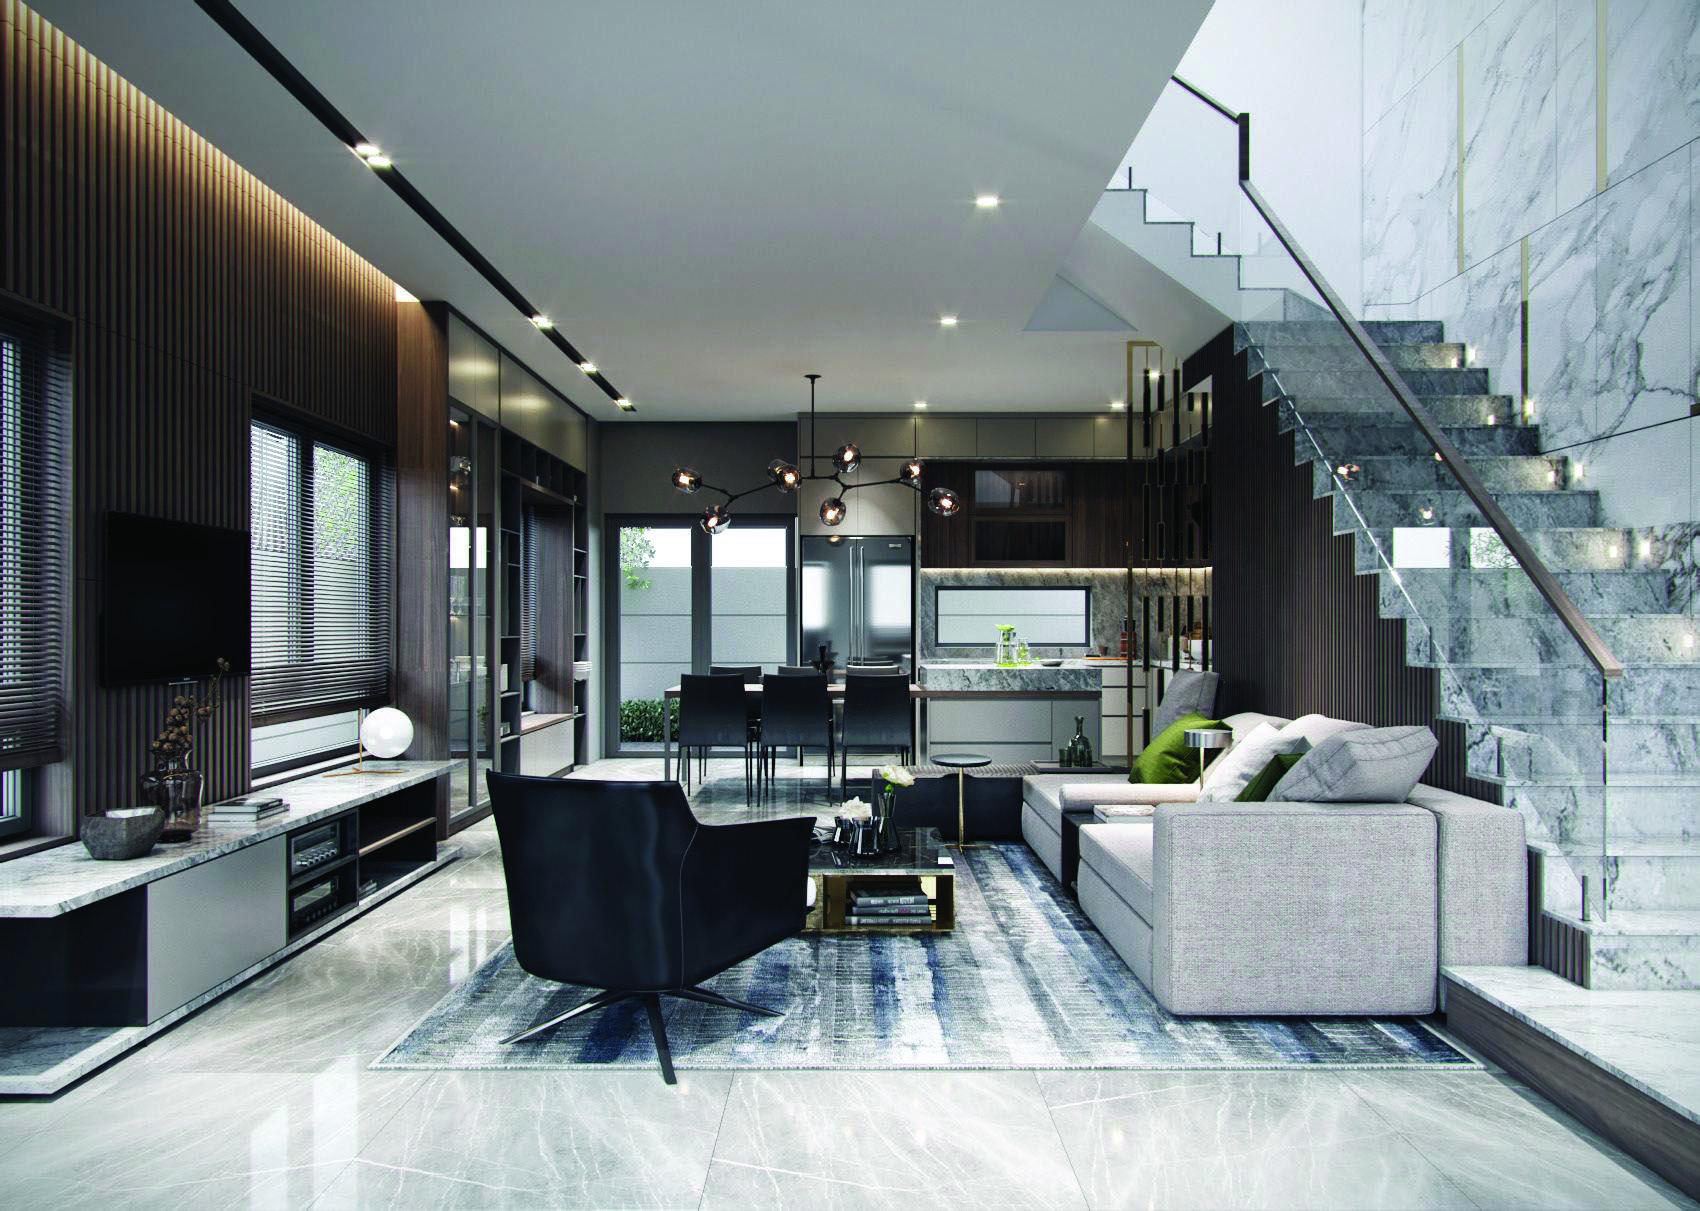 15 Luxury Living Room Designs Stunning Homes Tre Luxury Living Room Luxury Living Room Design Morden Living Room Million dollar homes living rooms